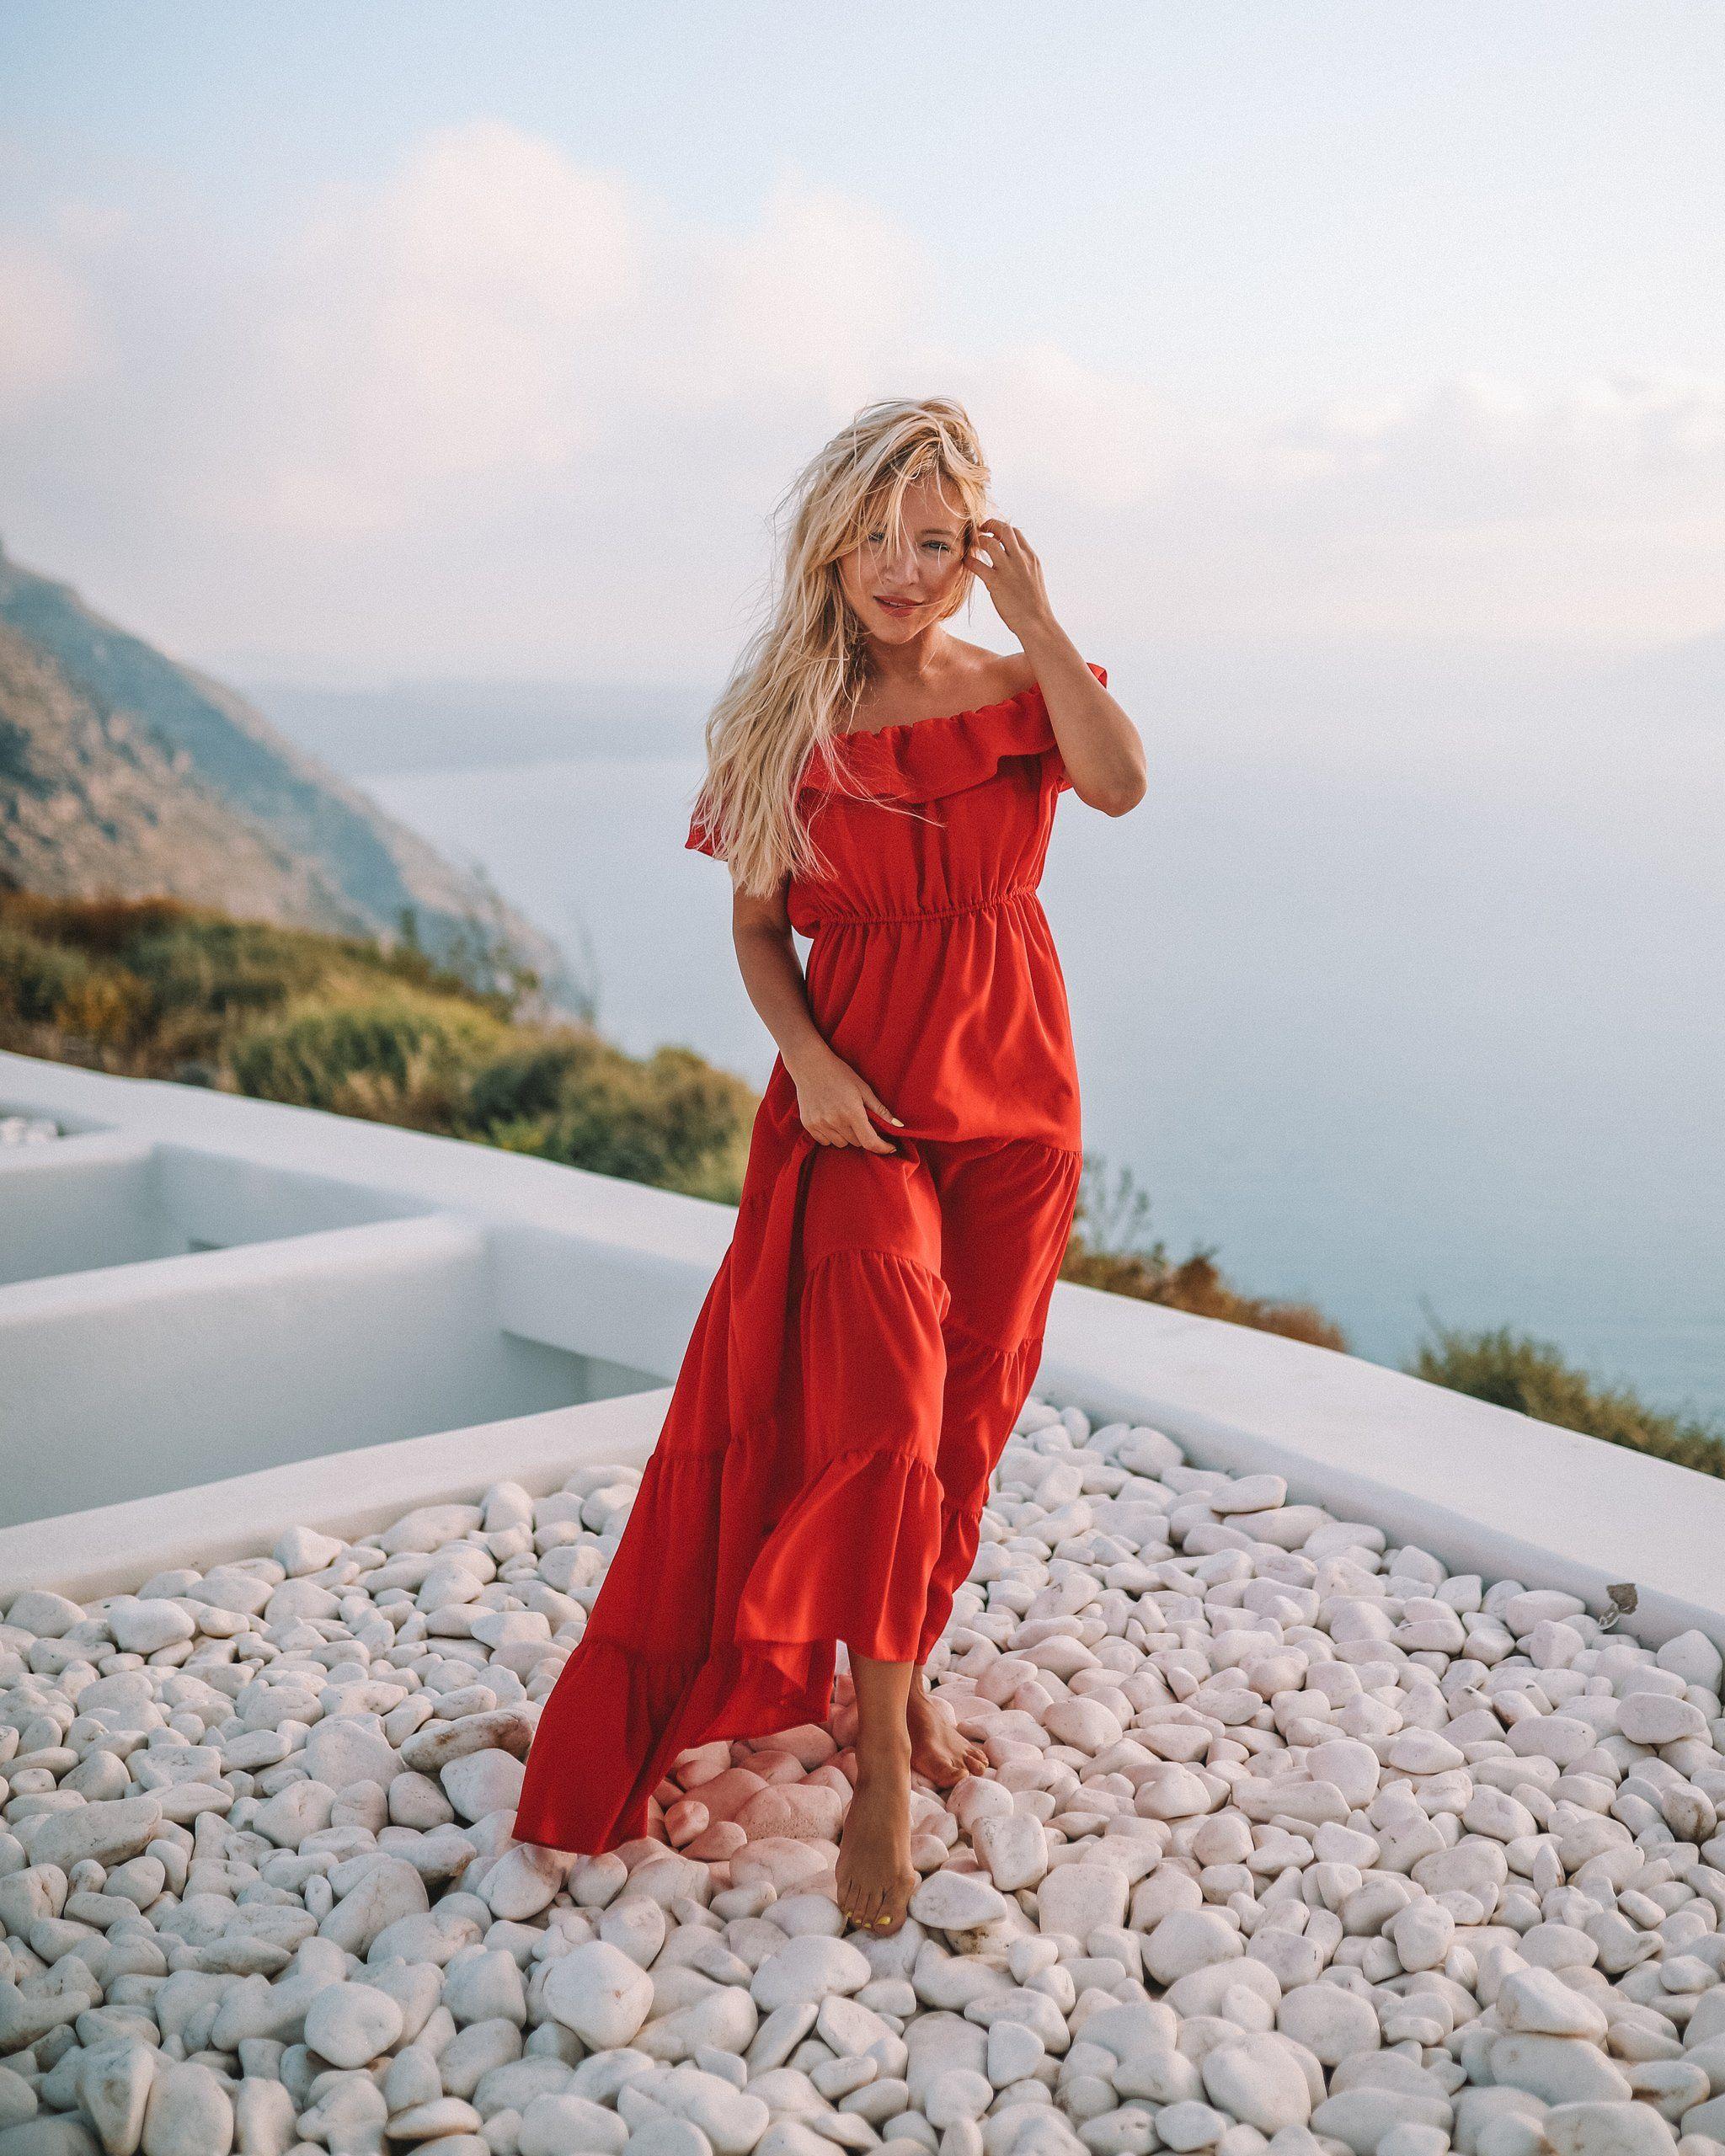 Latina Red Dress - Aggie Swimwear - Resort Wear